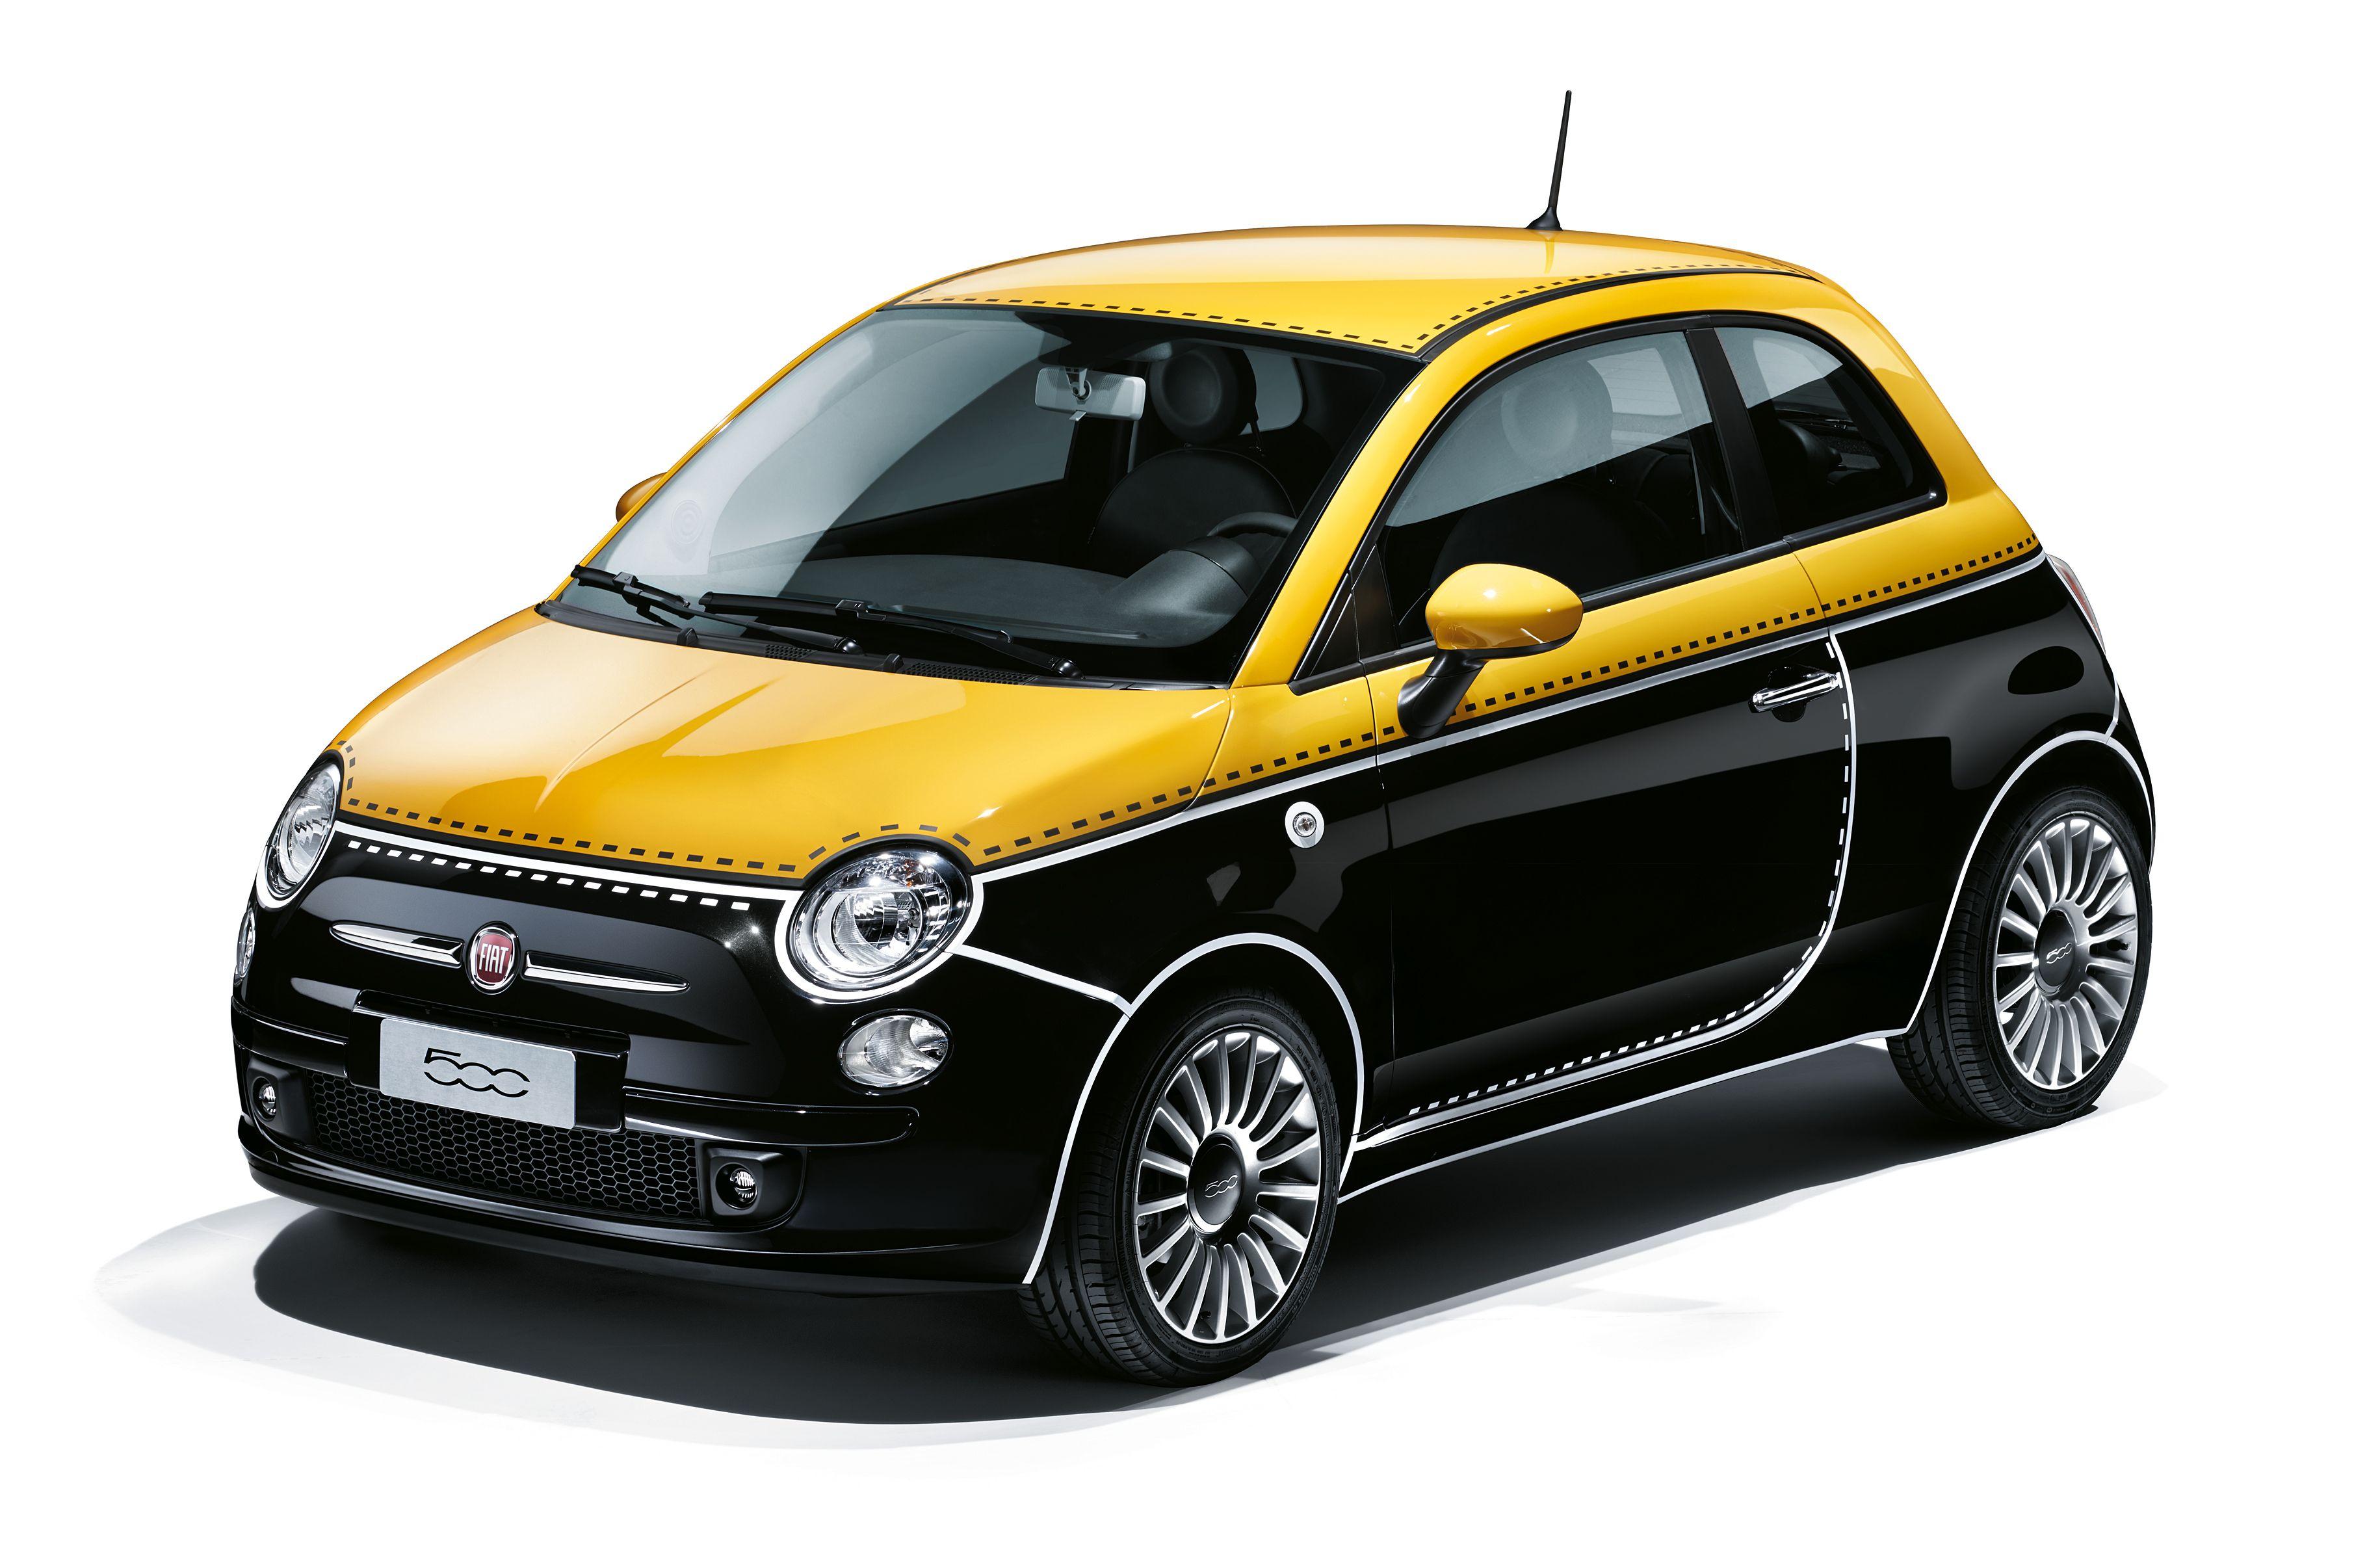 Weltpremiere In Paris Fiat 500 Ron Arad Edition Als Hommage An